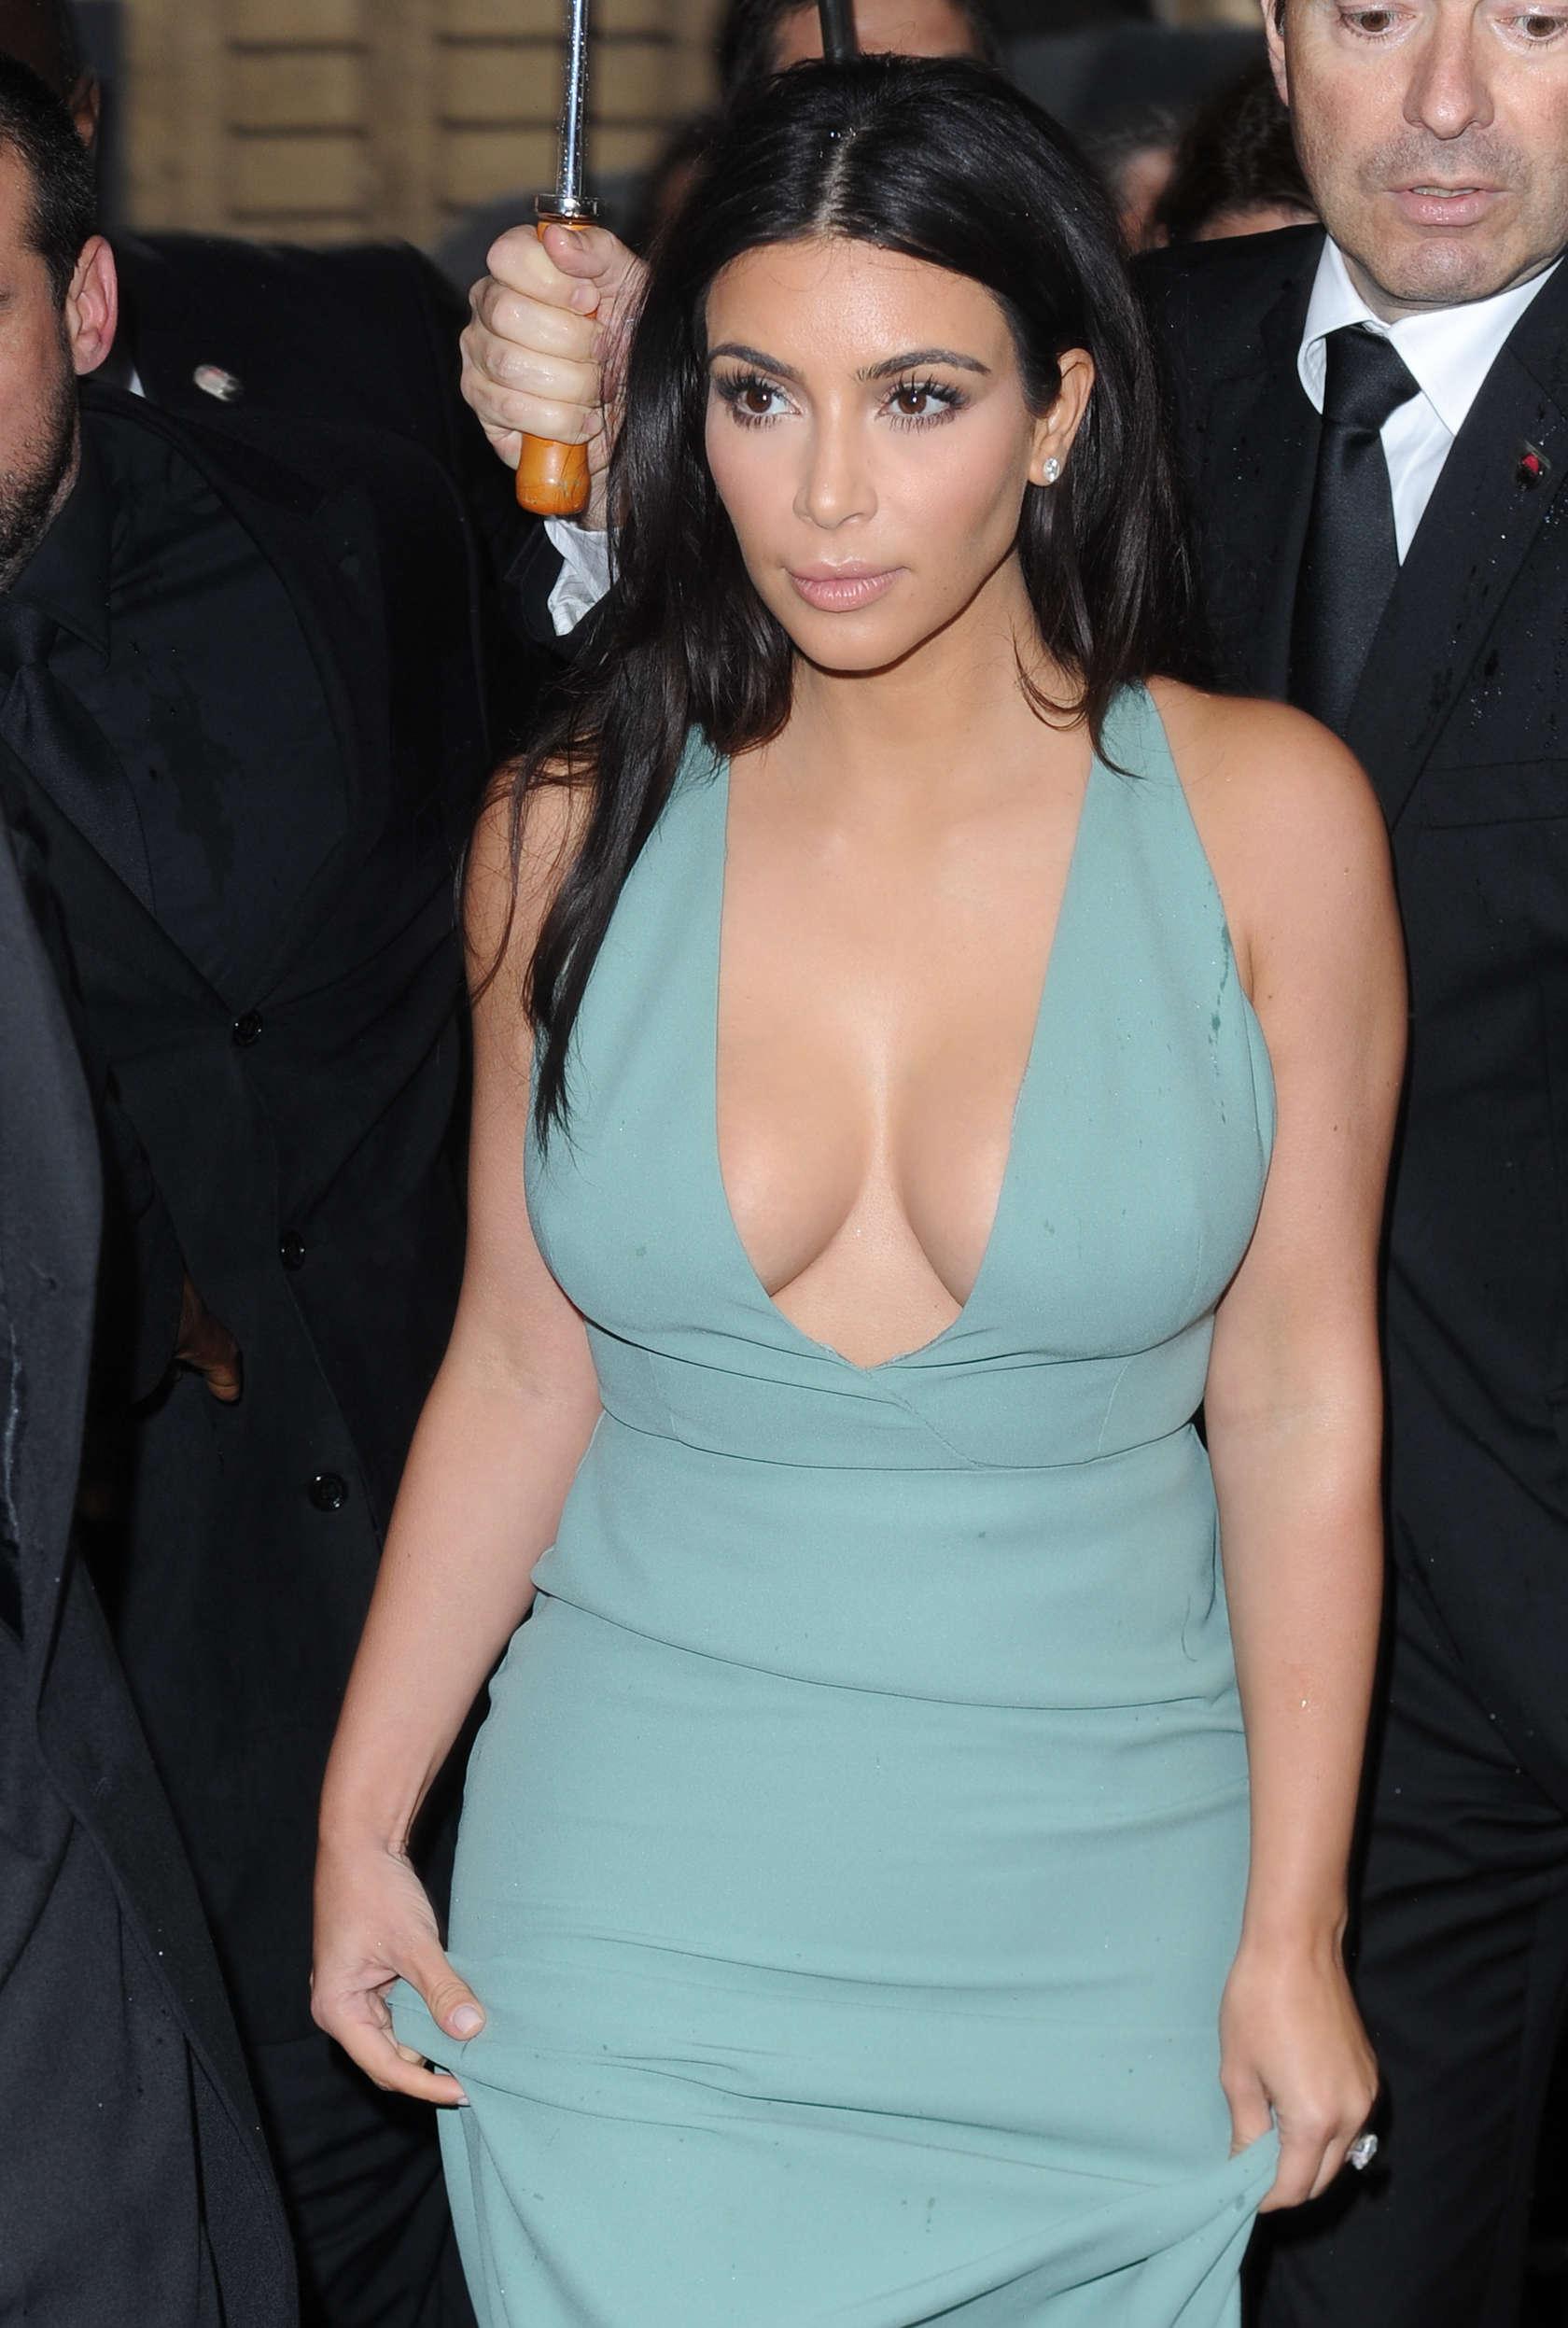 Kim Kardashian Hot Photos Fashin Week 2014 12 Gotceleb